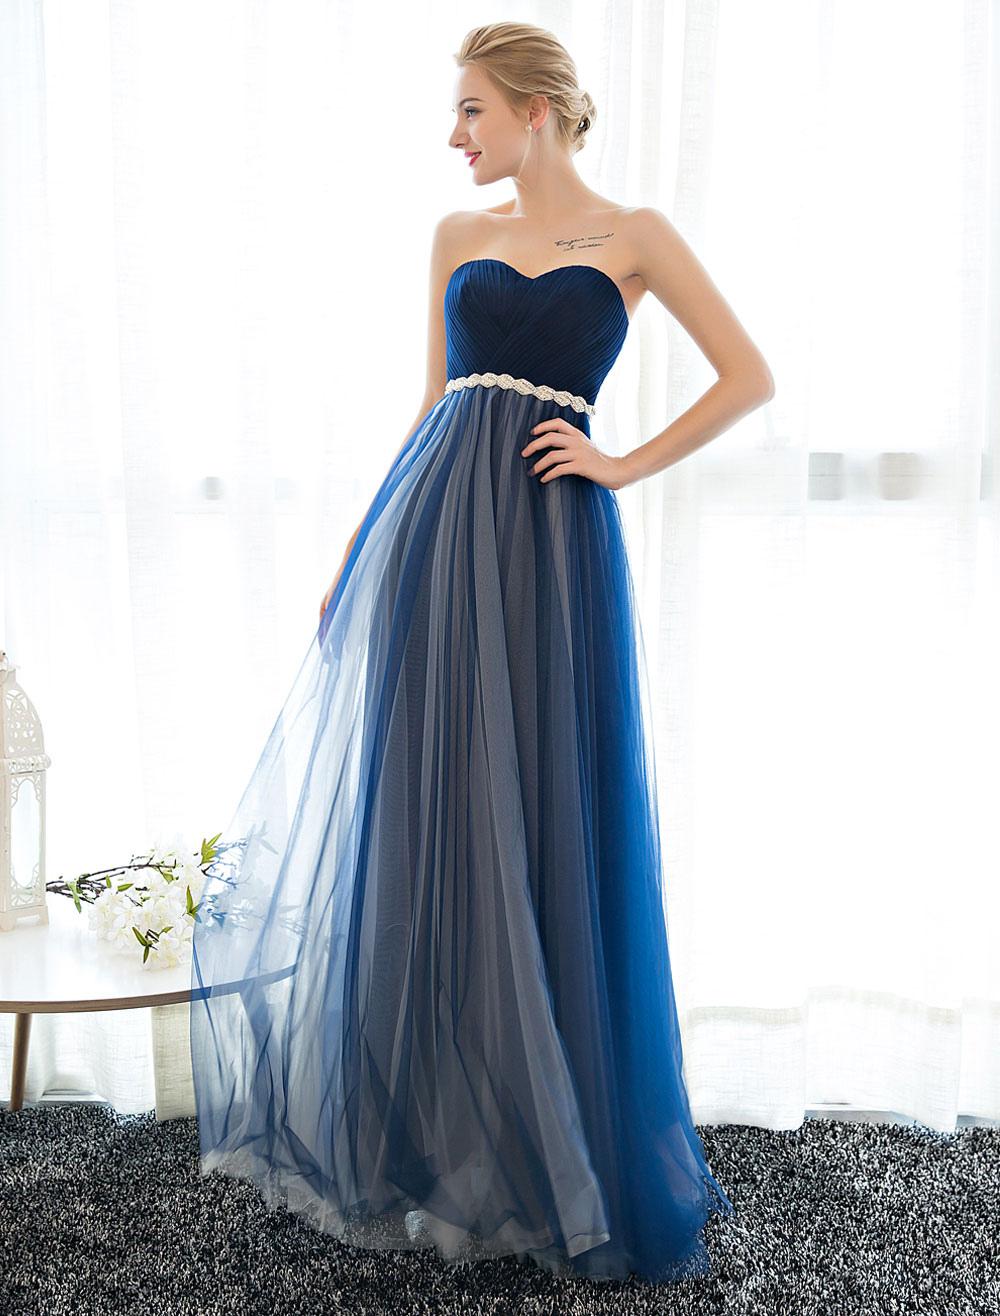 Buy Prom Dress Strapless Dark Navy Sweetheart Neckline Long Party Dresses Beaded Sash Pleated Tulle Floor Length Evening Dress for $101.19 in Milanoo store